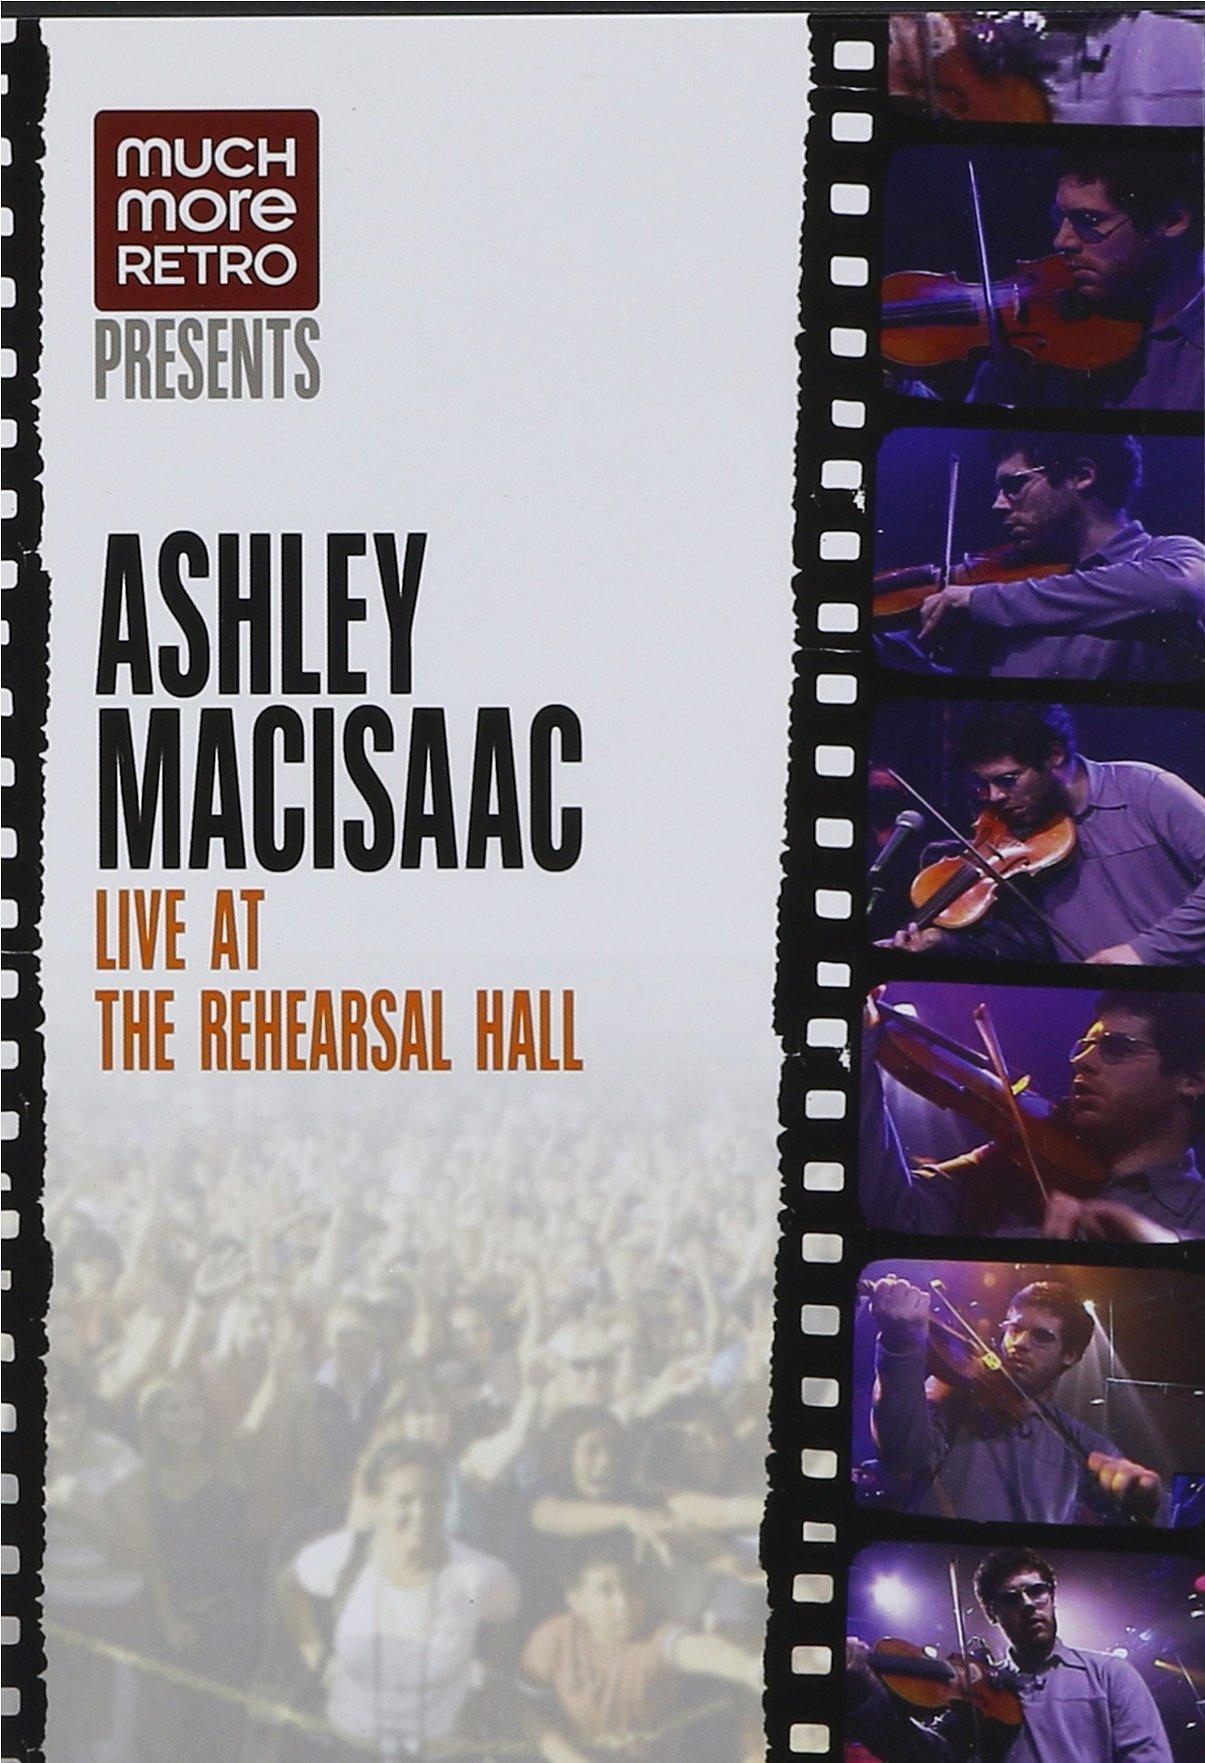 Ashley MacIsaac - Live at the Rehearsal Hall